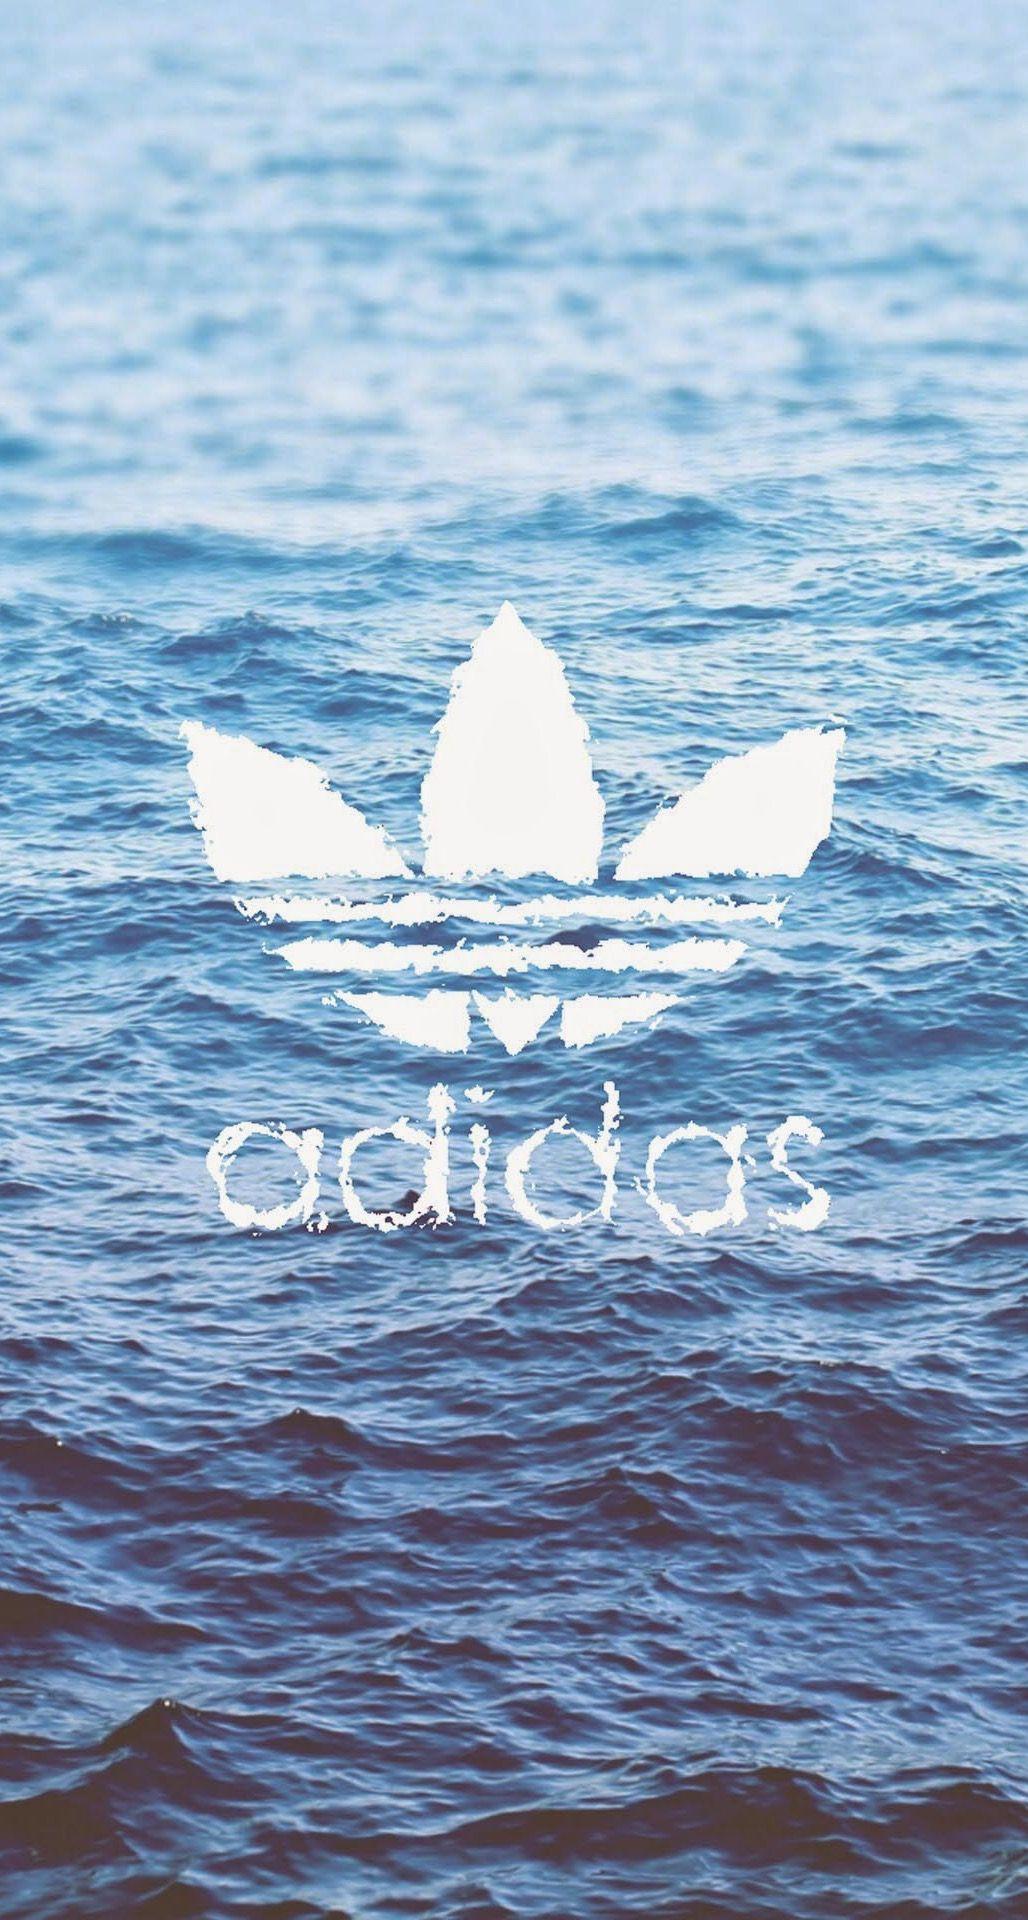 Most Inspiring Wallpaper Adidas Iphone 6s Plus - ee56aa608379a7eb4e4ef5fa5d17704e  Pic_261019      .jpg